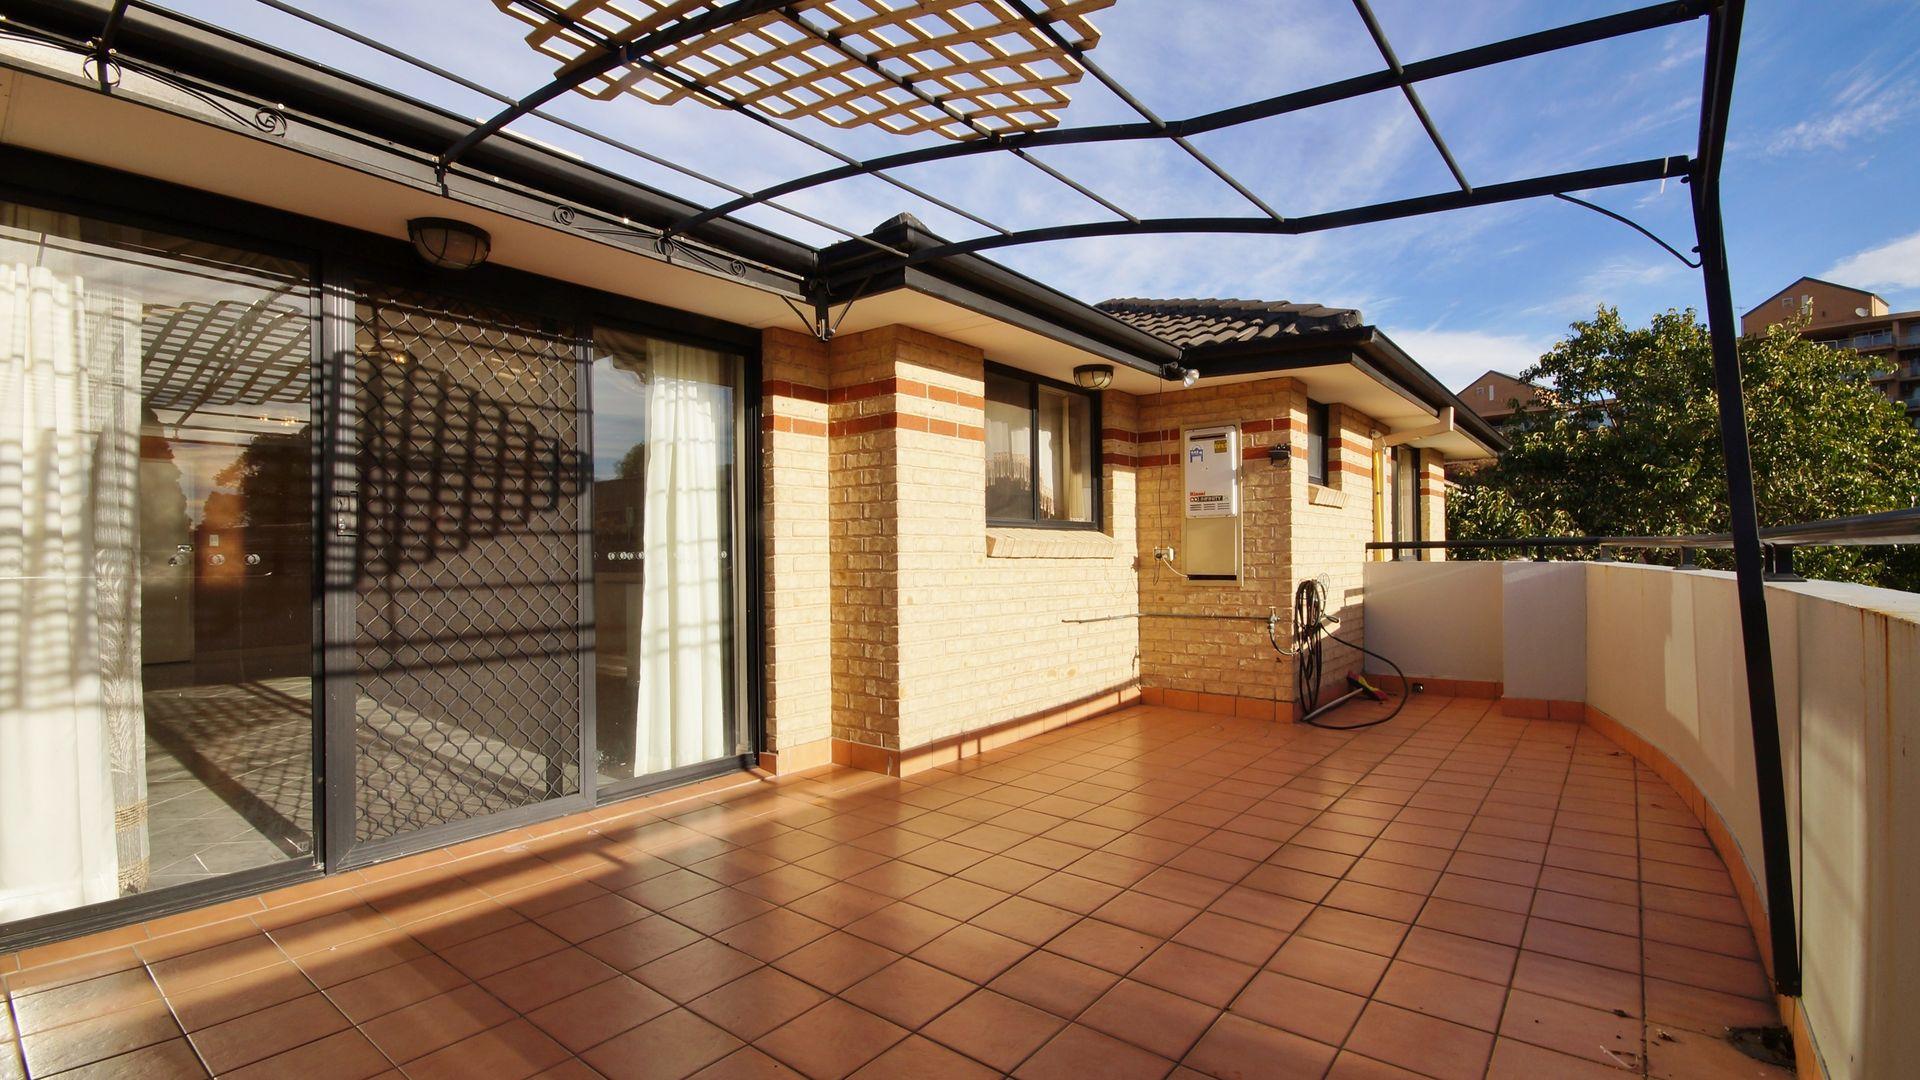 17/14-16 Macquarie Rd, Auburn NSW 2144, Image 7